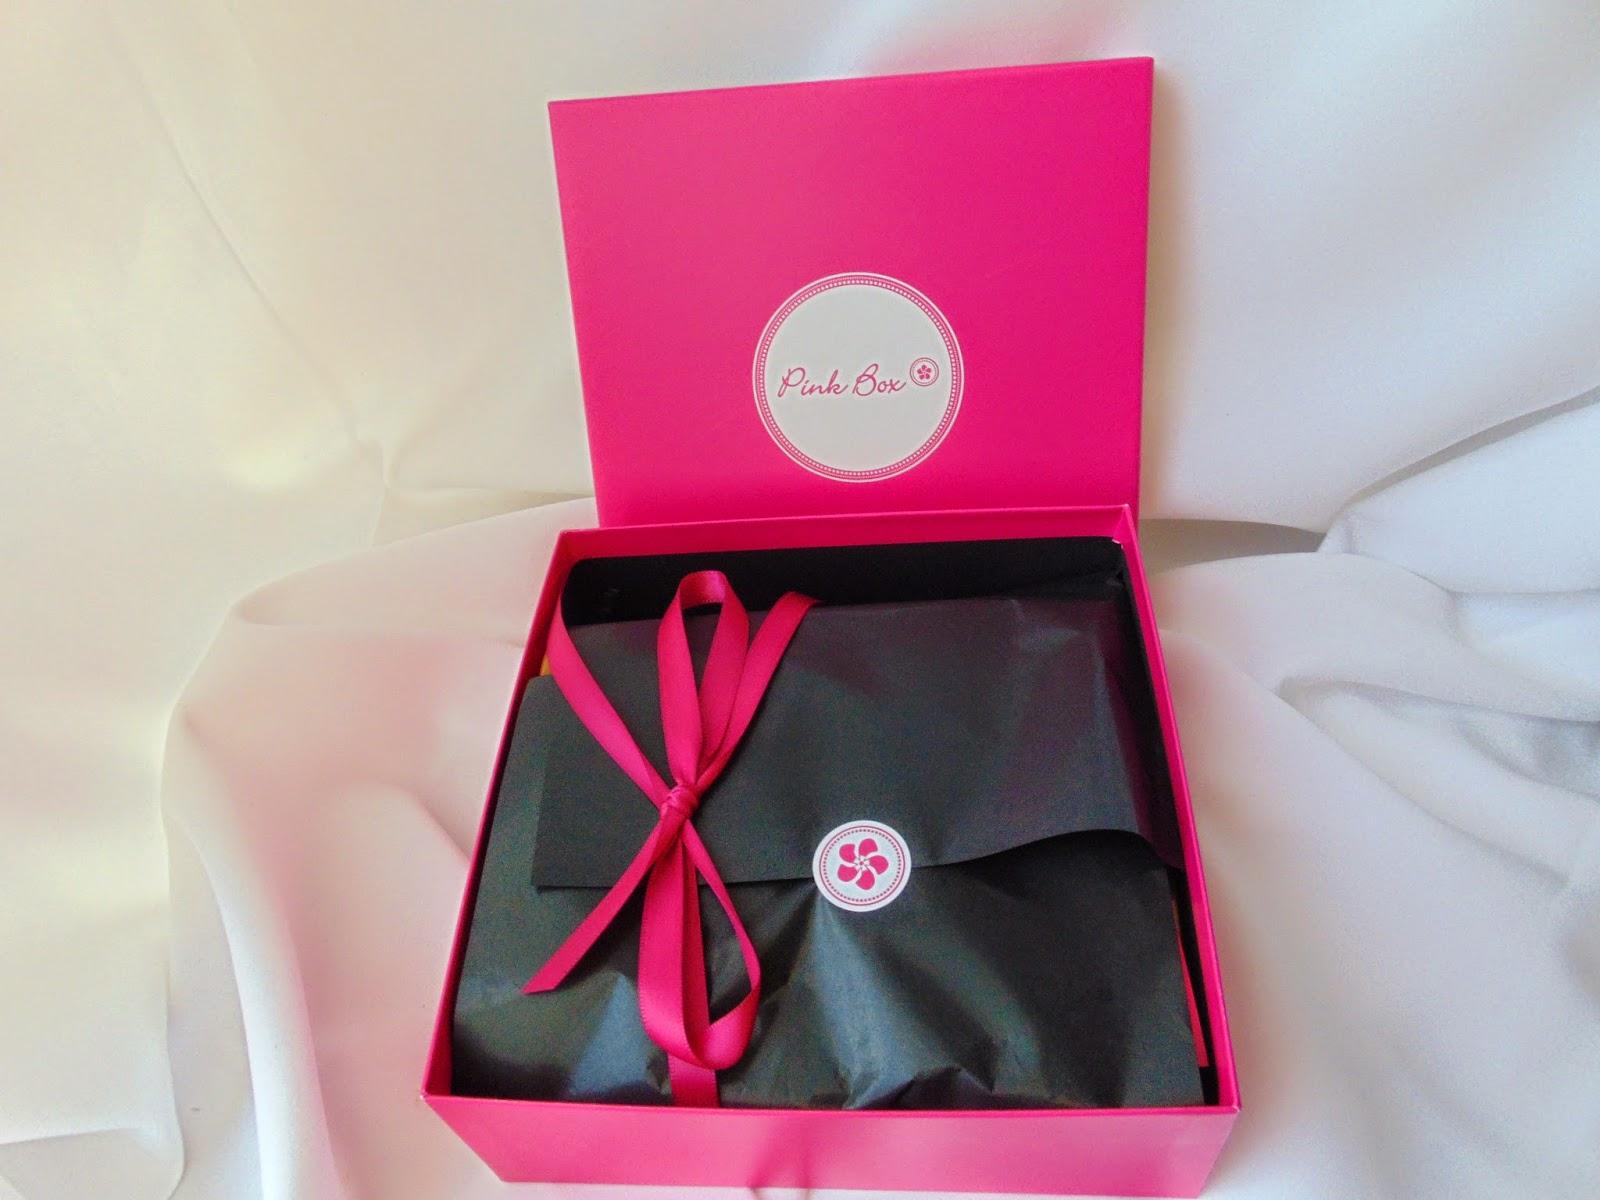 Pink Box vs. Glossy Box - März - www.annitschkasblog.de